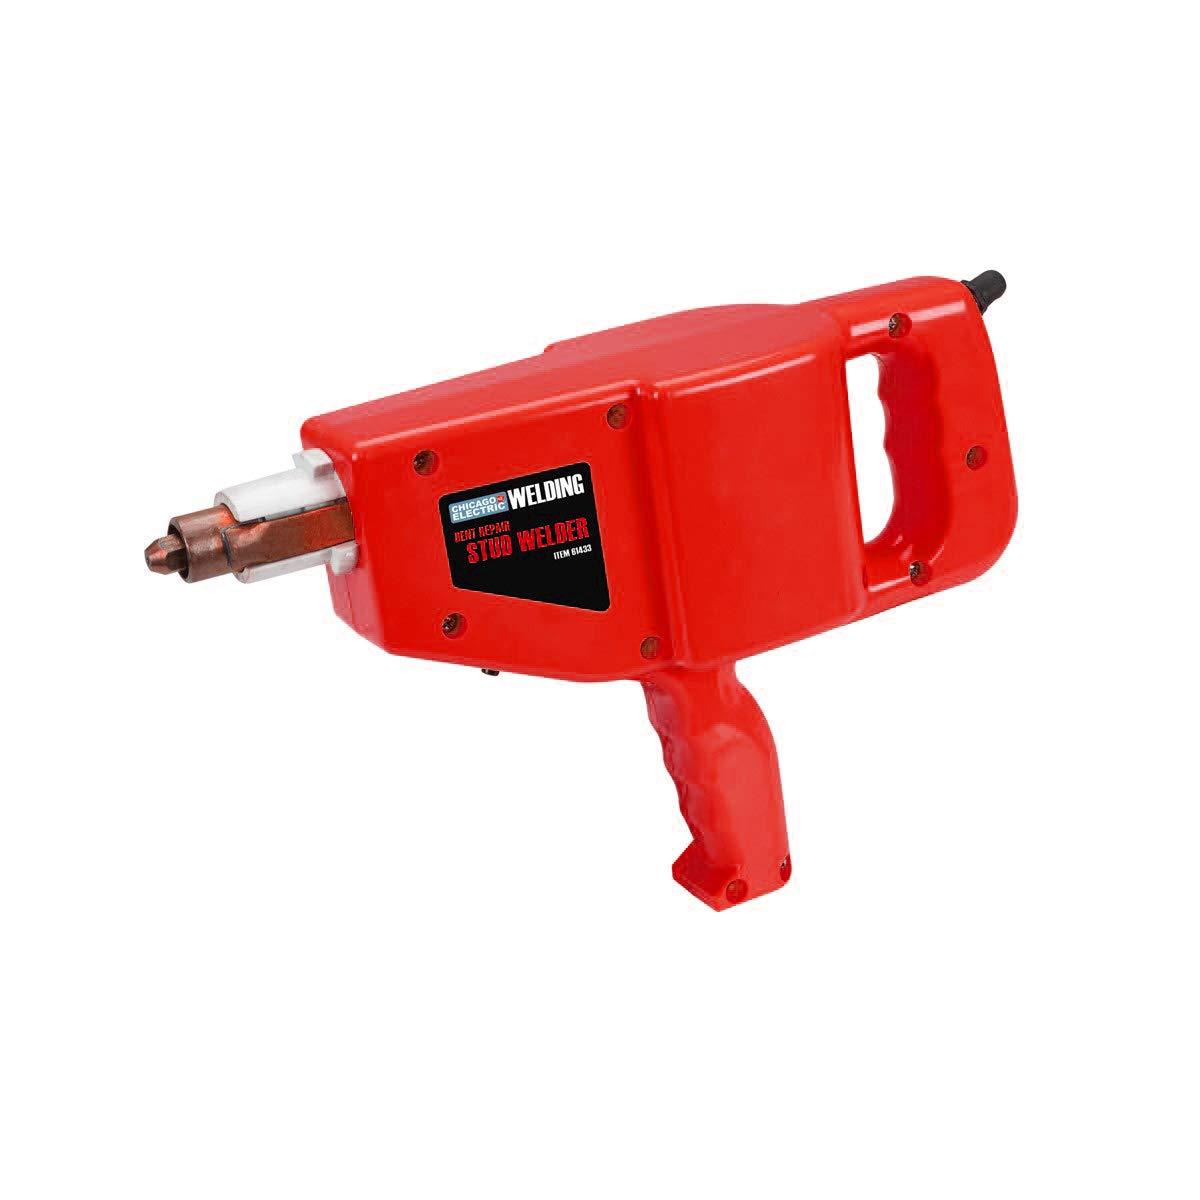 TruePower Stud Welder Dent Repair Kit by TruePower (Image #1)